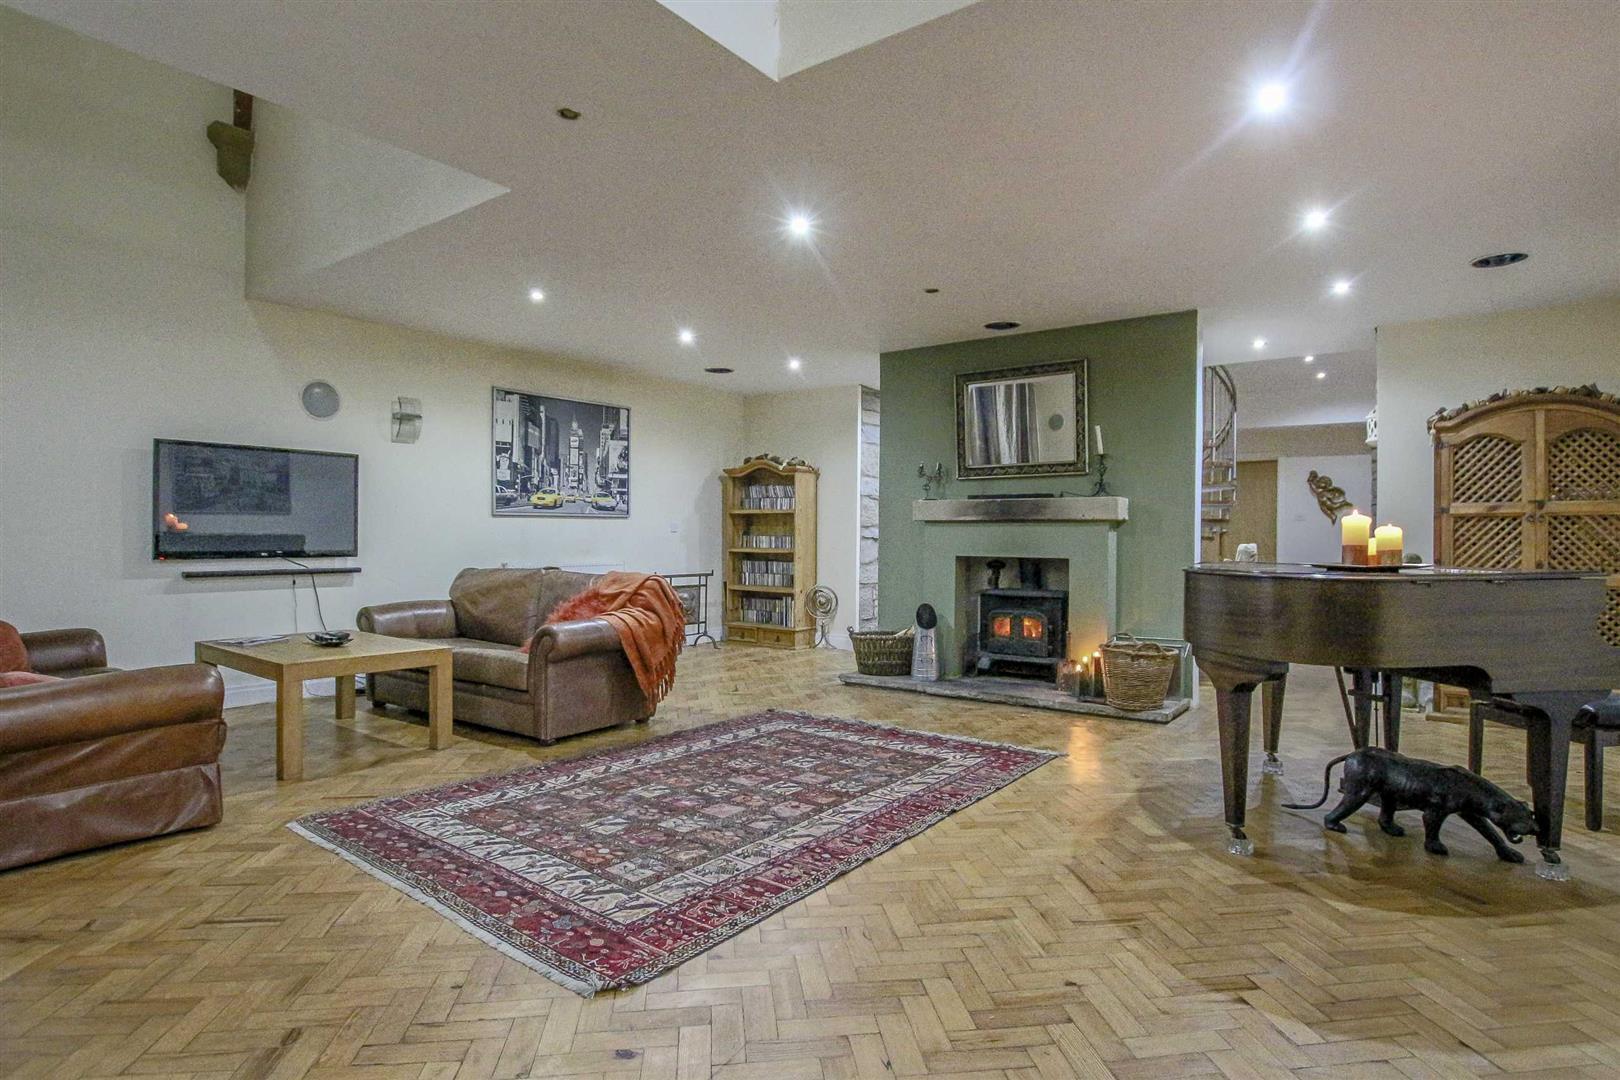 5 Bedroom Detached House For Sale - Image 4